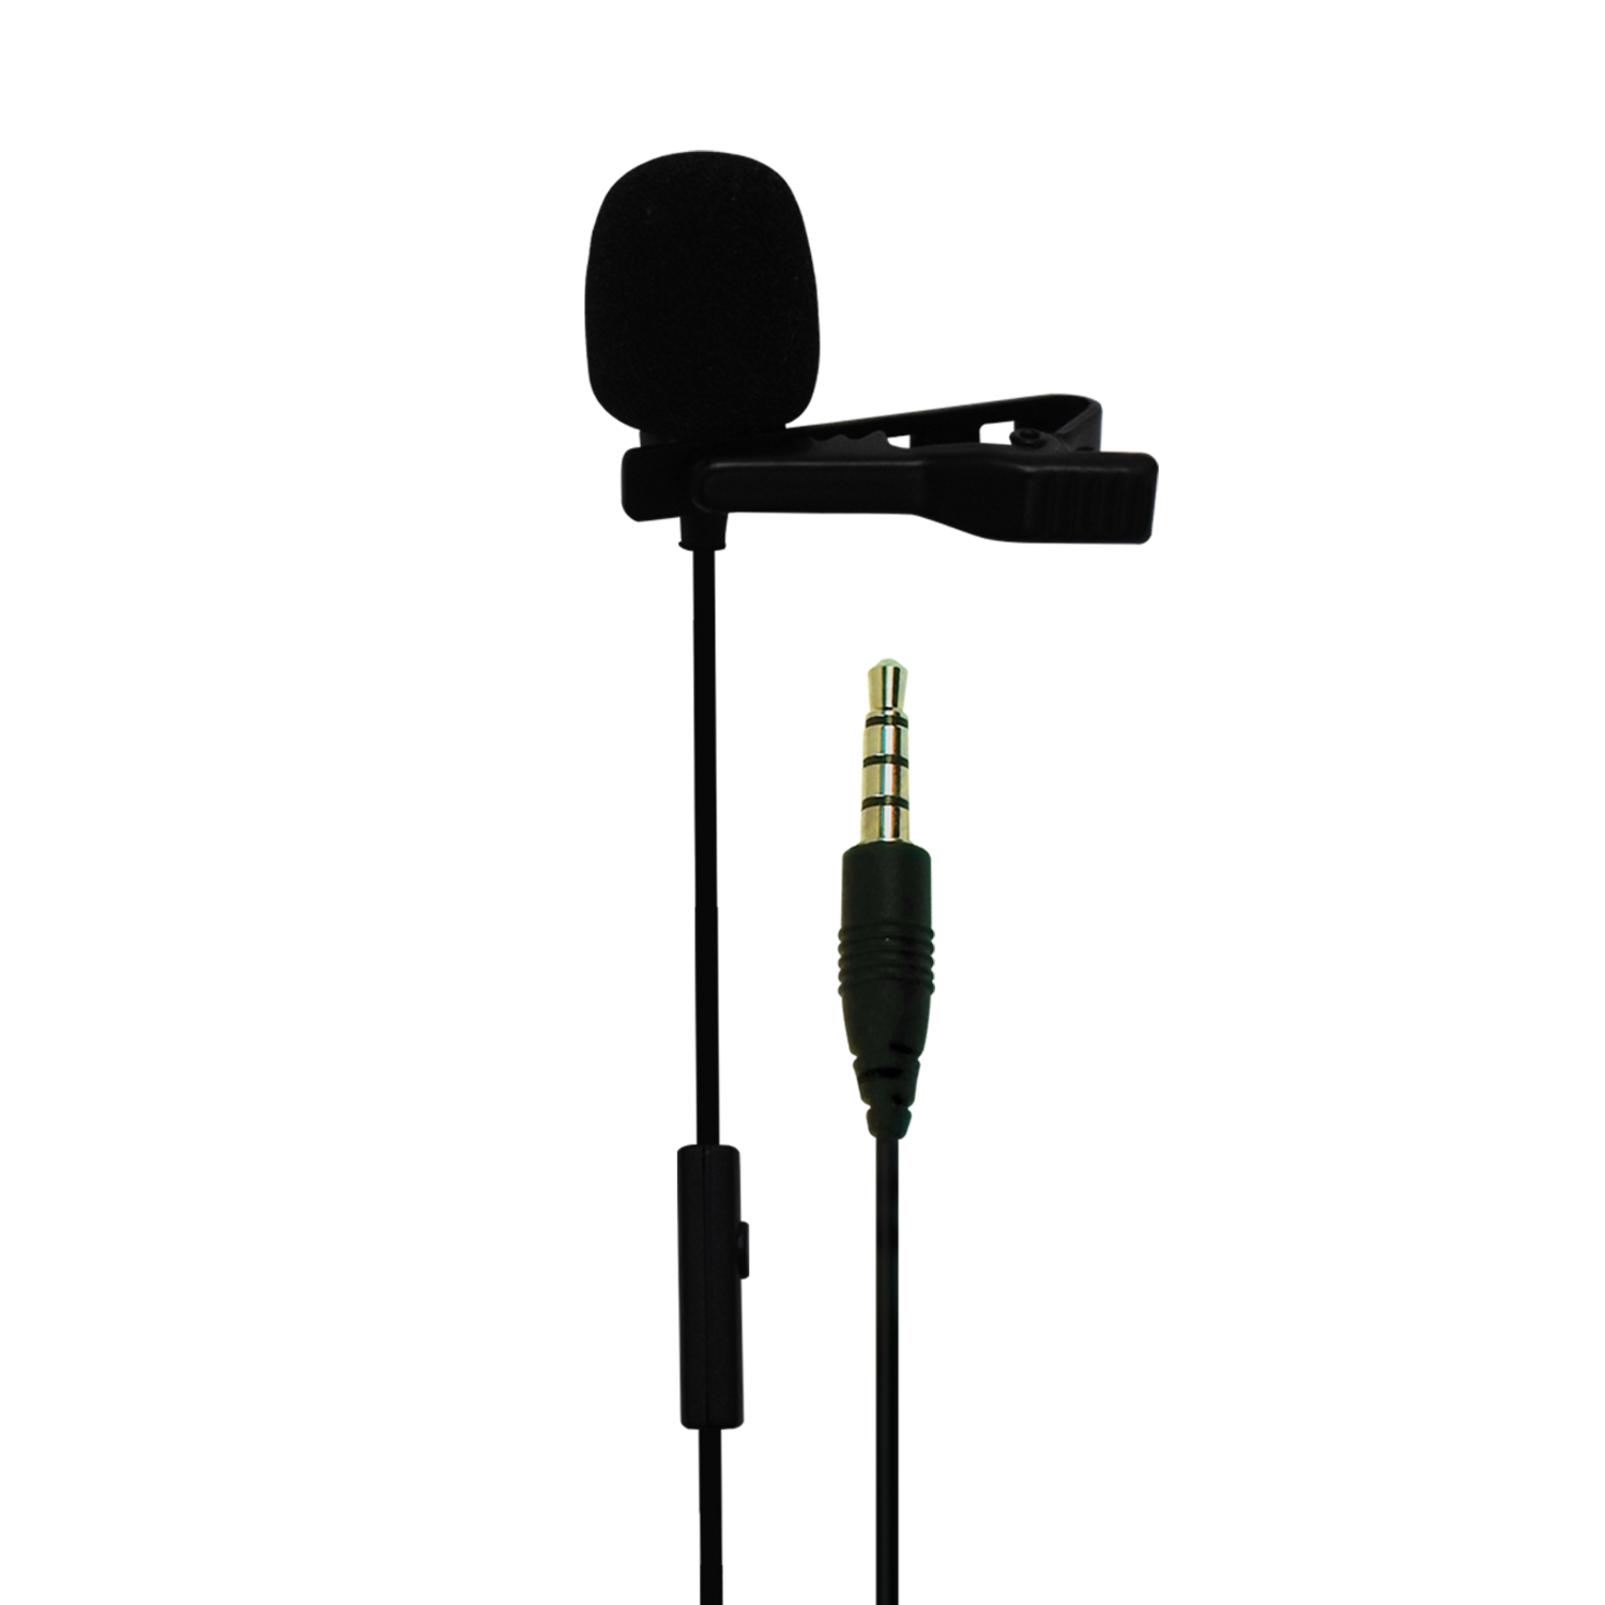 CSLM30 - Black - Clip-on Omnidirectional Lavalier Microphone - Detailshot 1